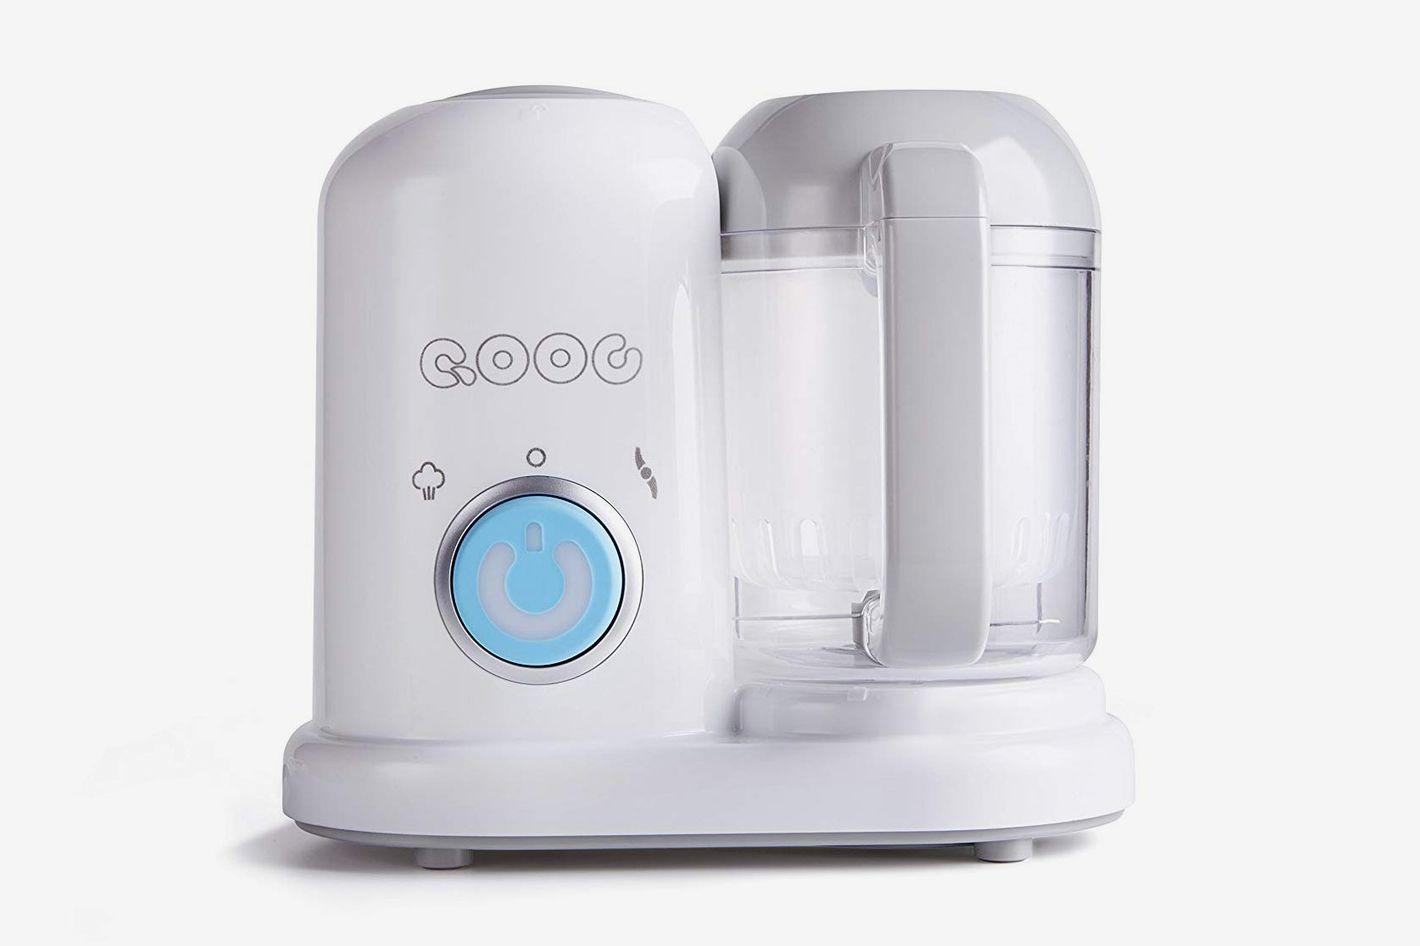 QOOC 4-in-1 Mini Baby-Food Maker